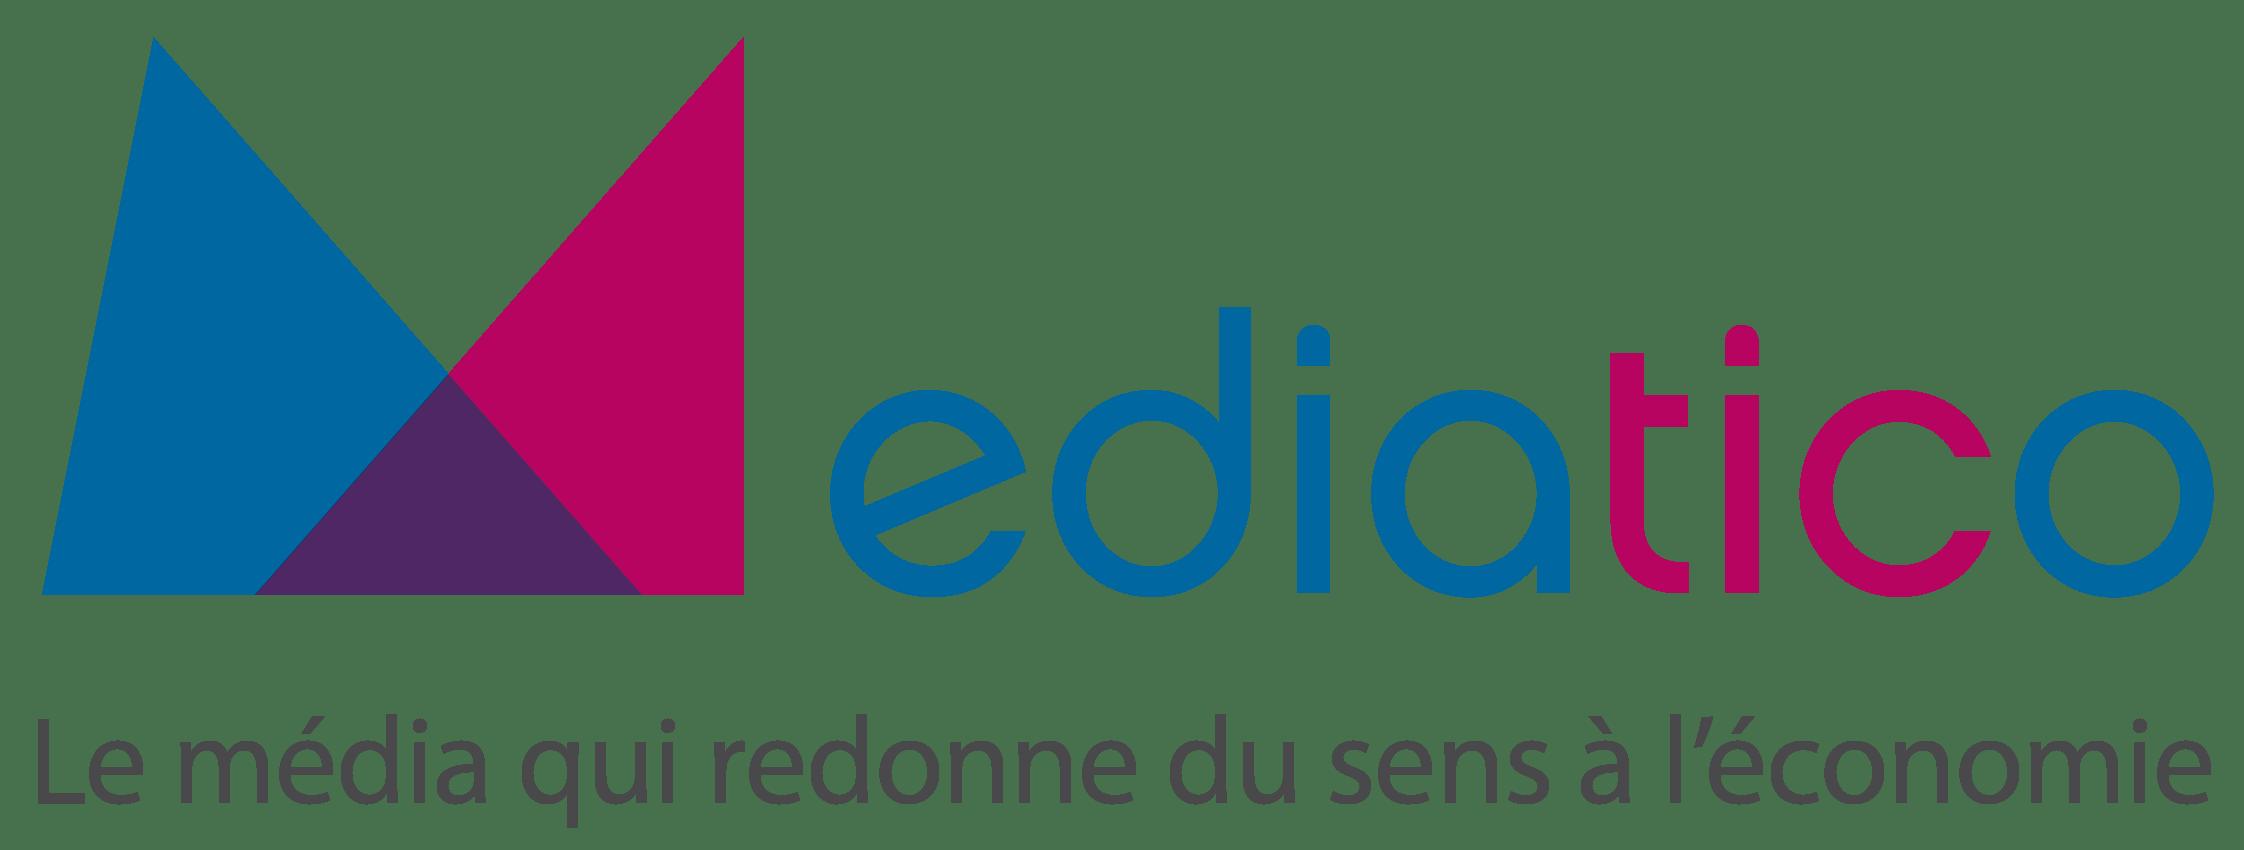 M Logo Mediatico 2018 Media